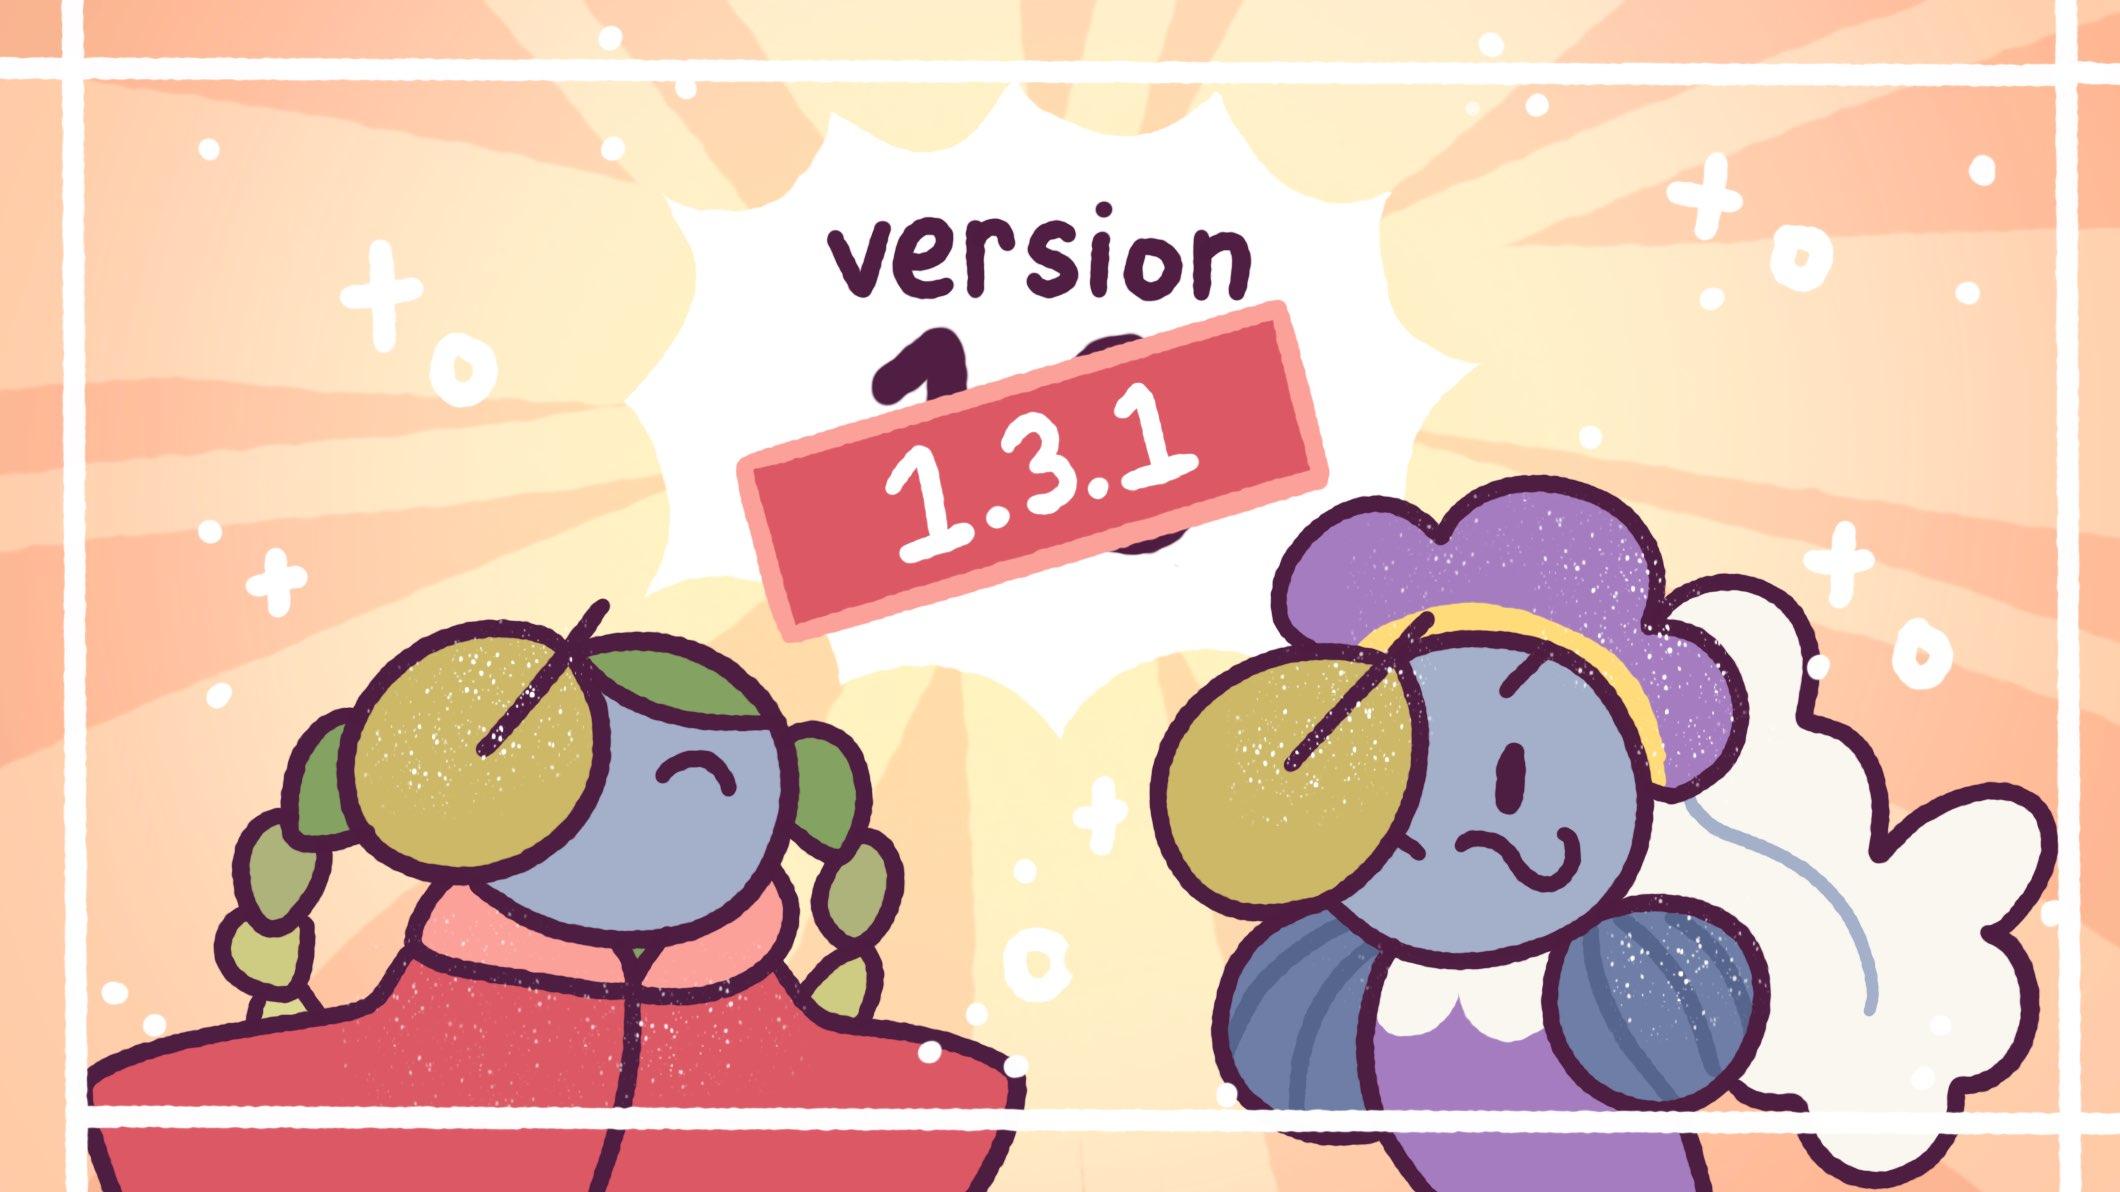 Version 1.3.1